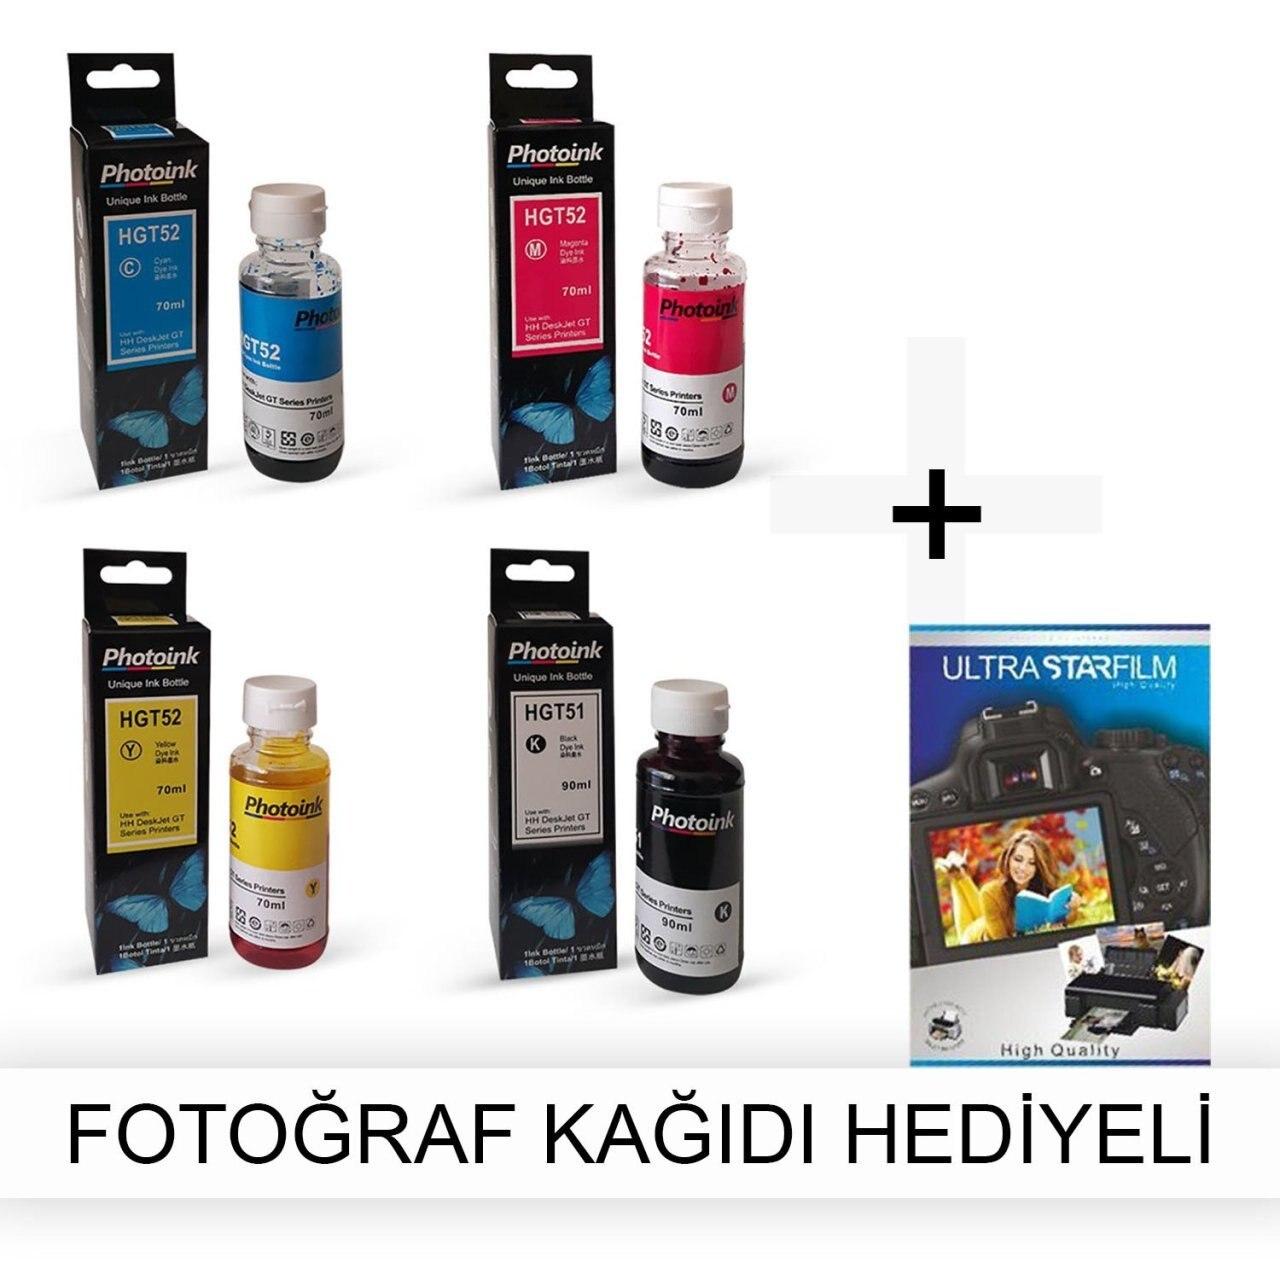 HP Deskjet 916c 1 Suit Photoink Ink Photo Paper Gift Photo Paper     - title=